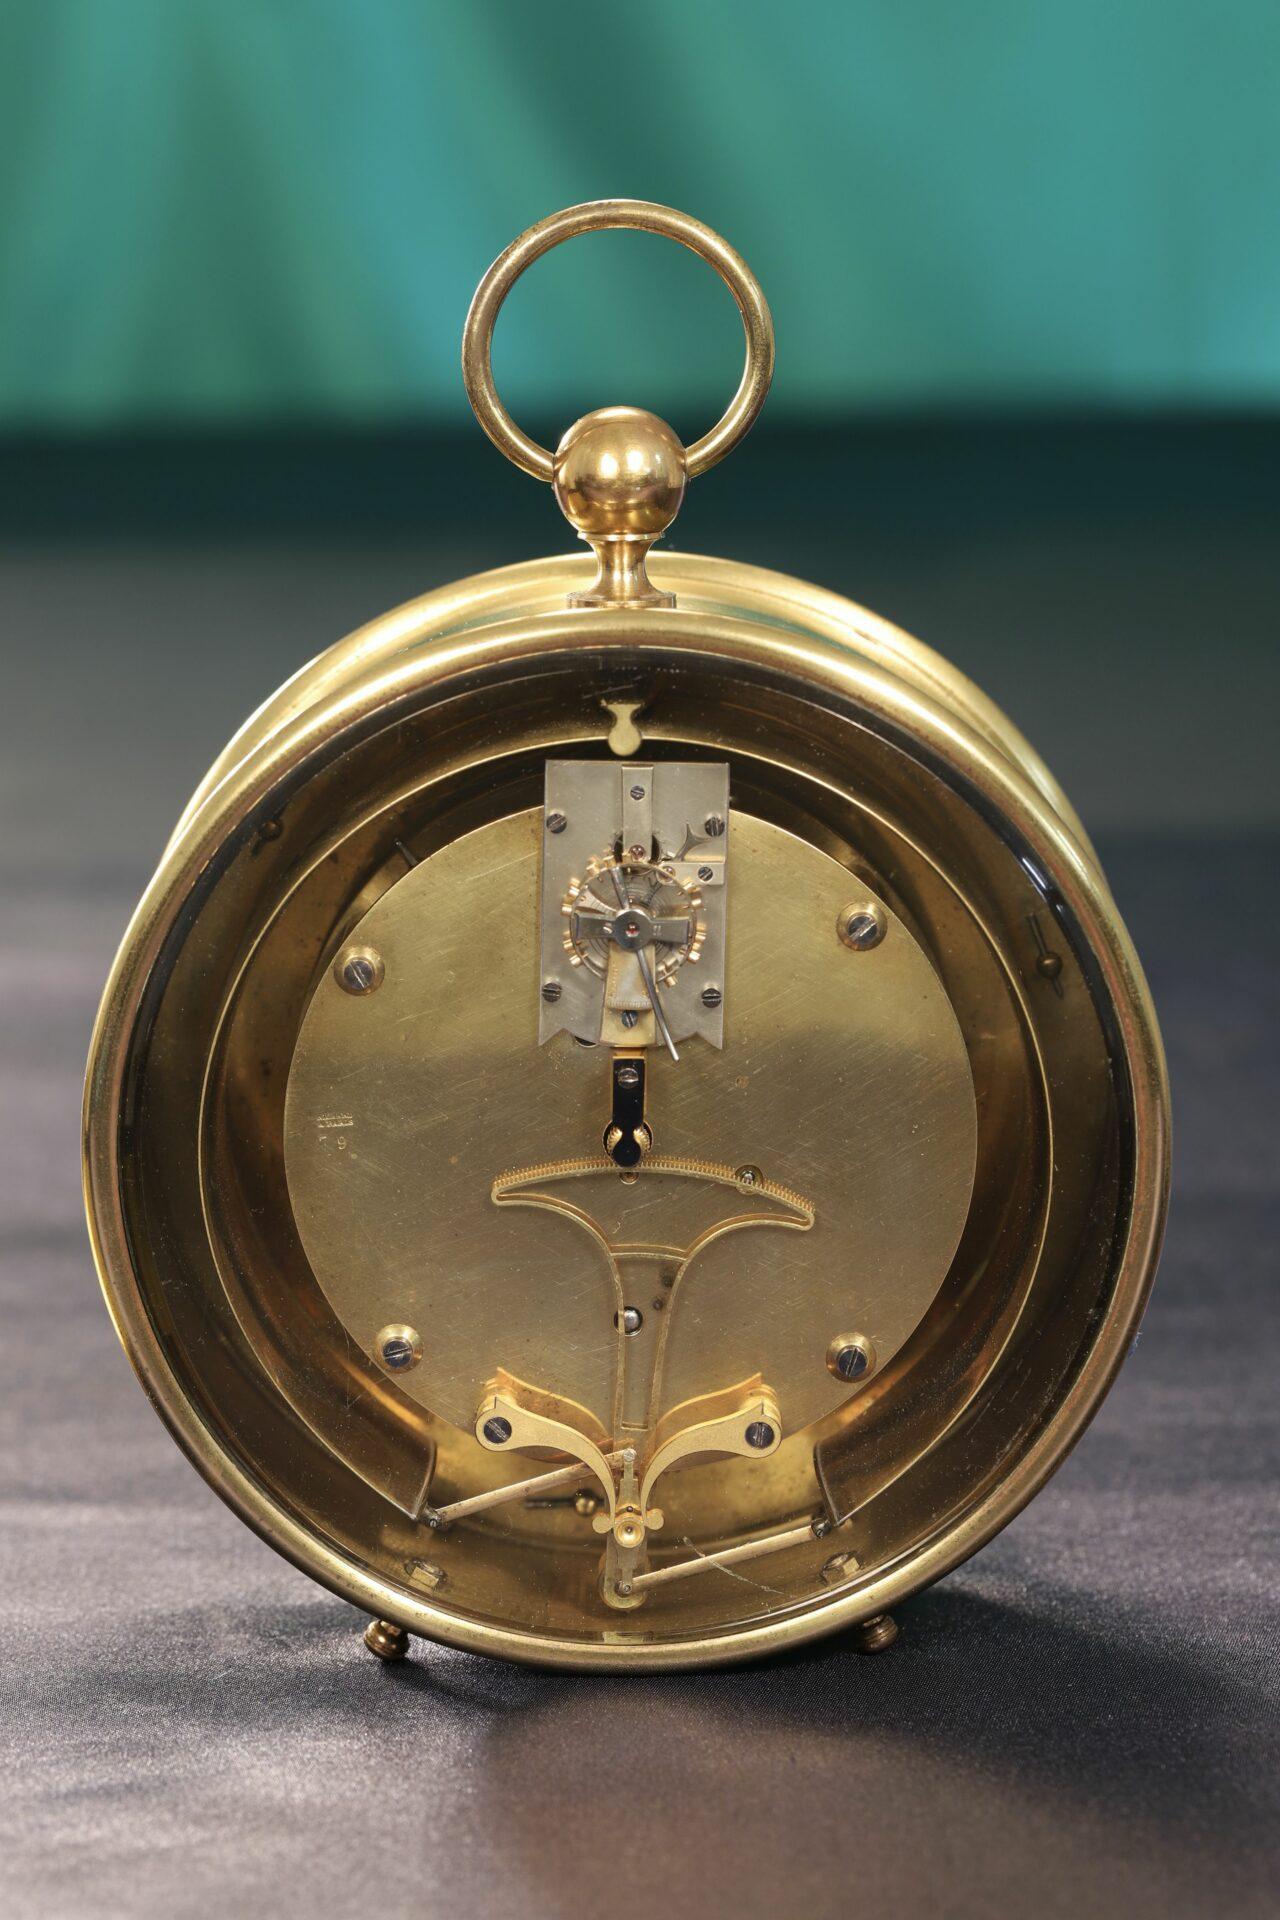 Rear view of Bourdon & Richard Barometer Clock No 79 c1880